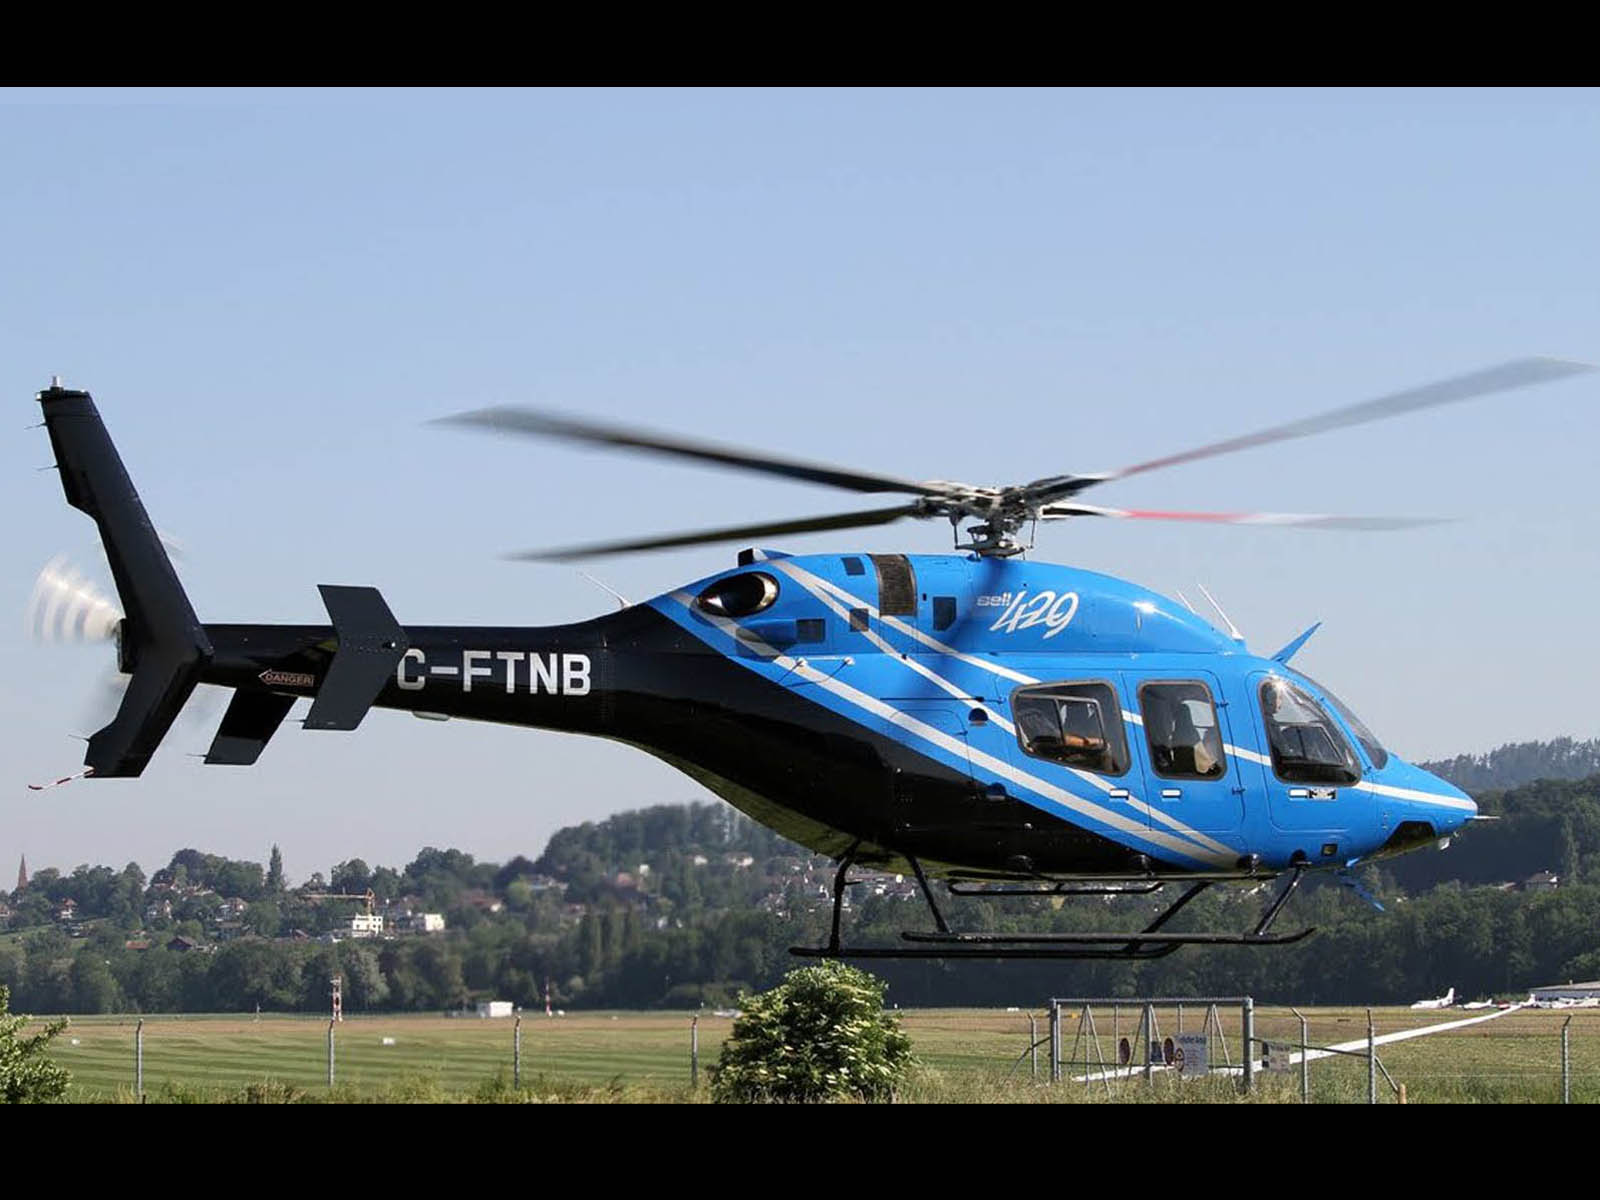 Free Download 3d Wallpapers For Windows 7 Desktop Wallpapers Bell 429 Globalranger Helicopter